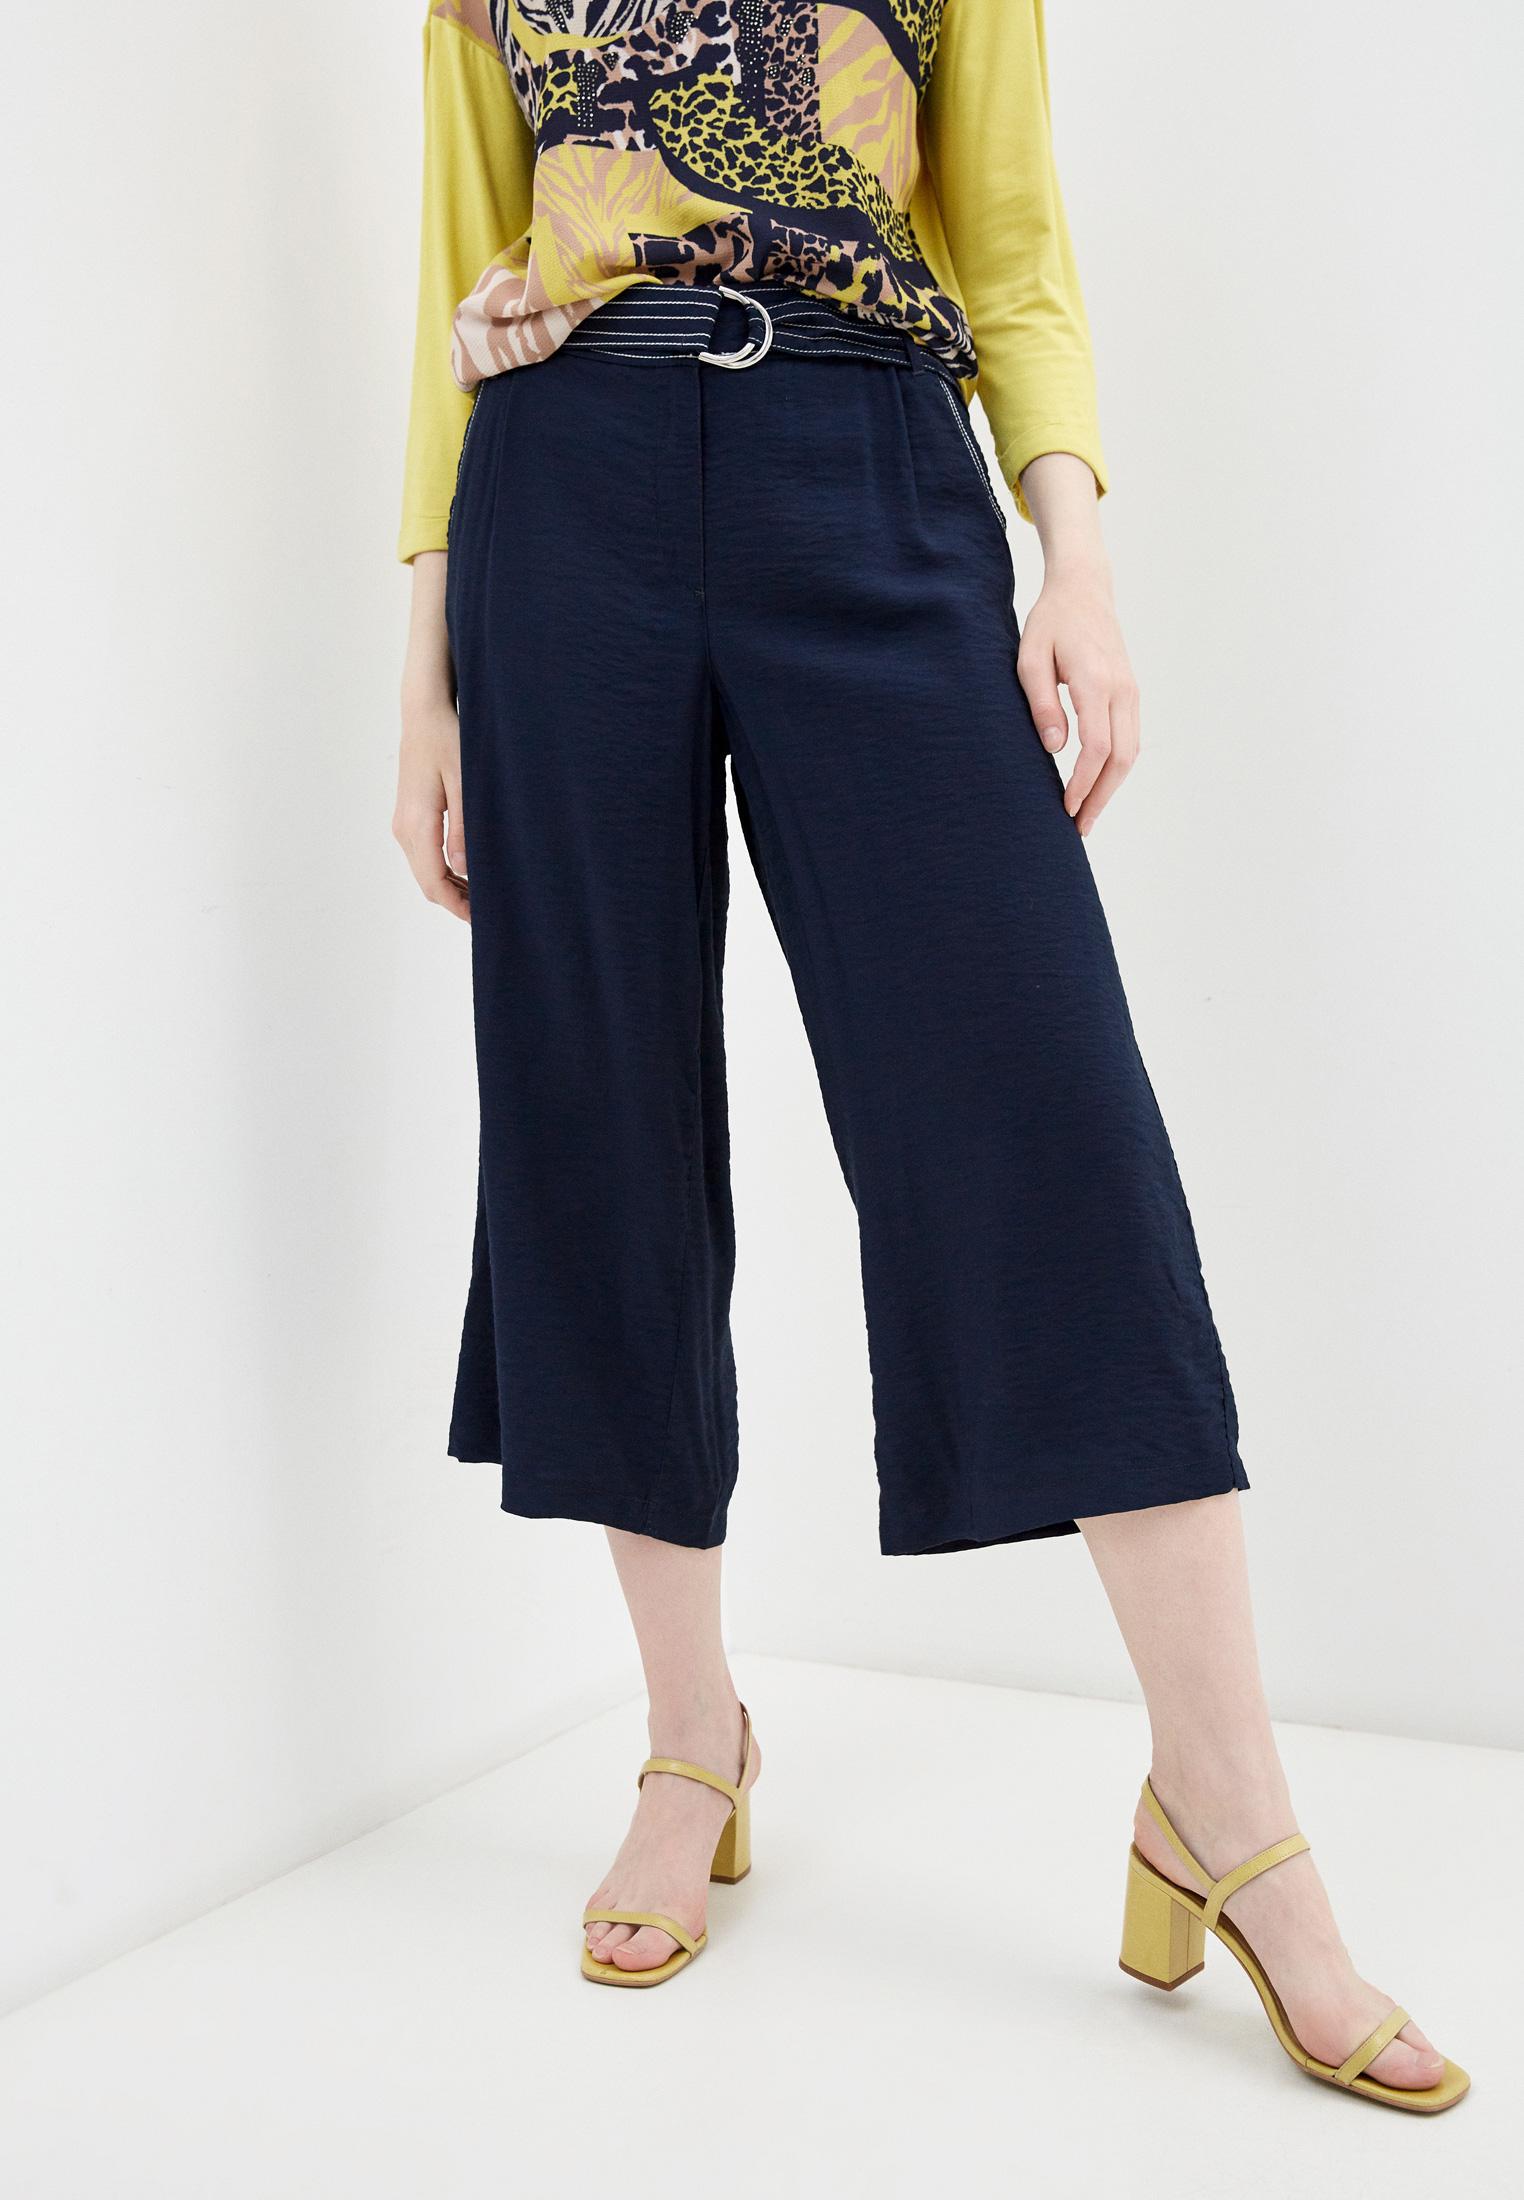 Женские прямые брюки Betty Barclay 6388/1224